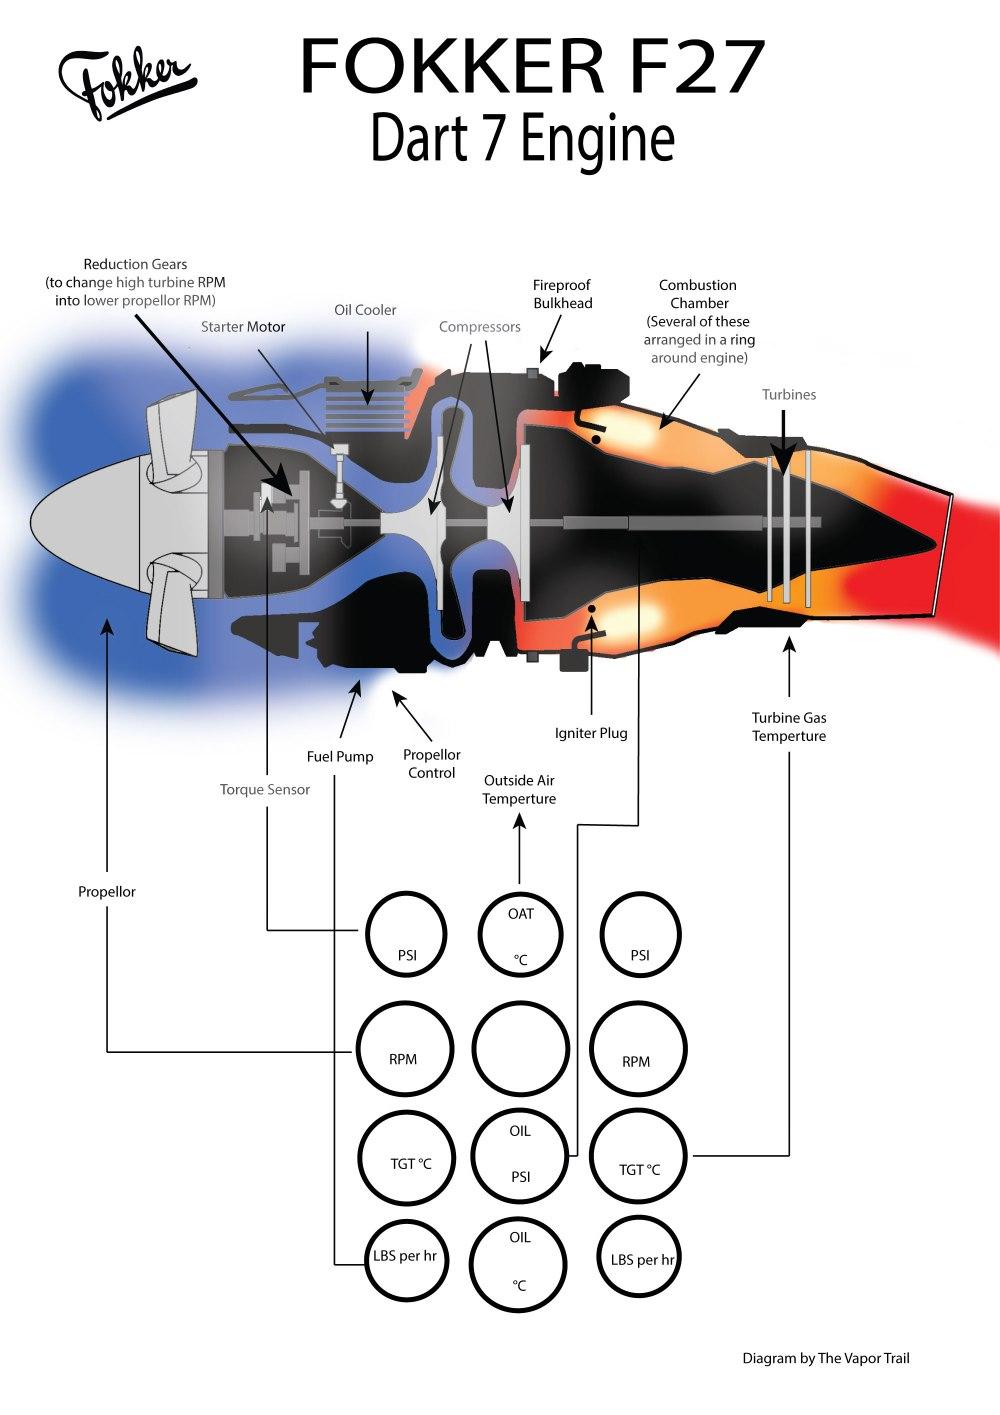 hight resolution of fokker f27 dart 7 engine diagram